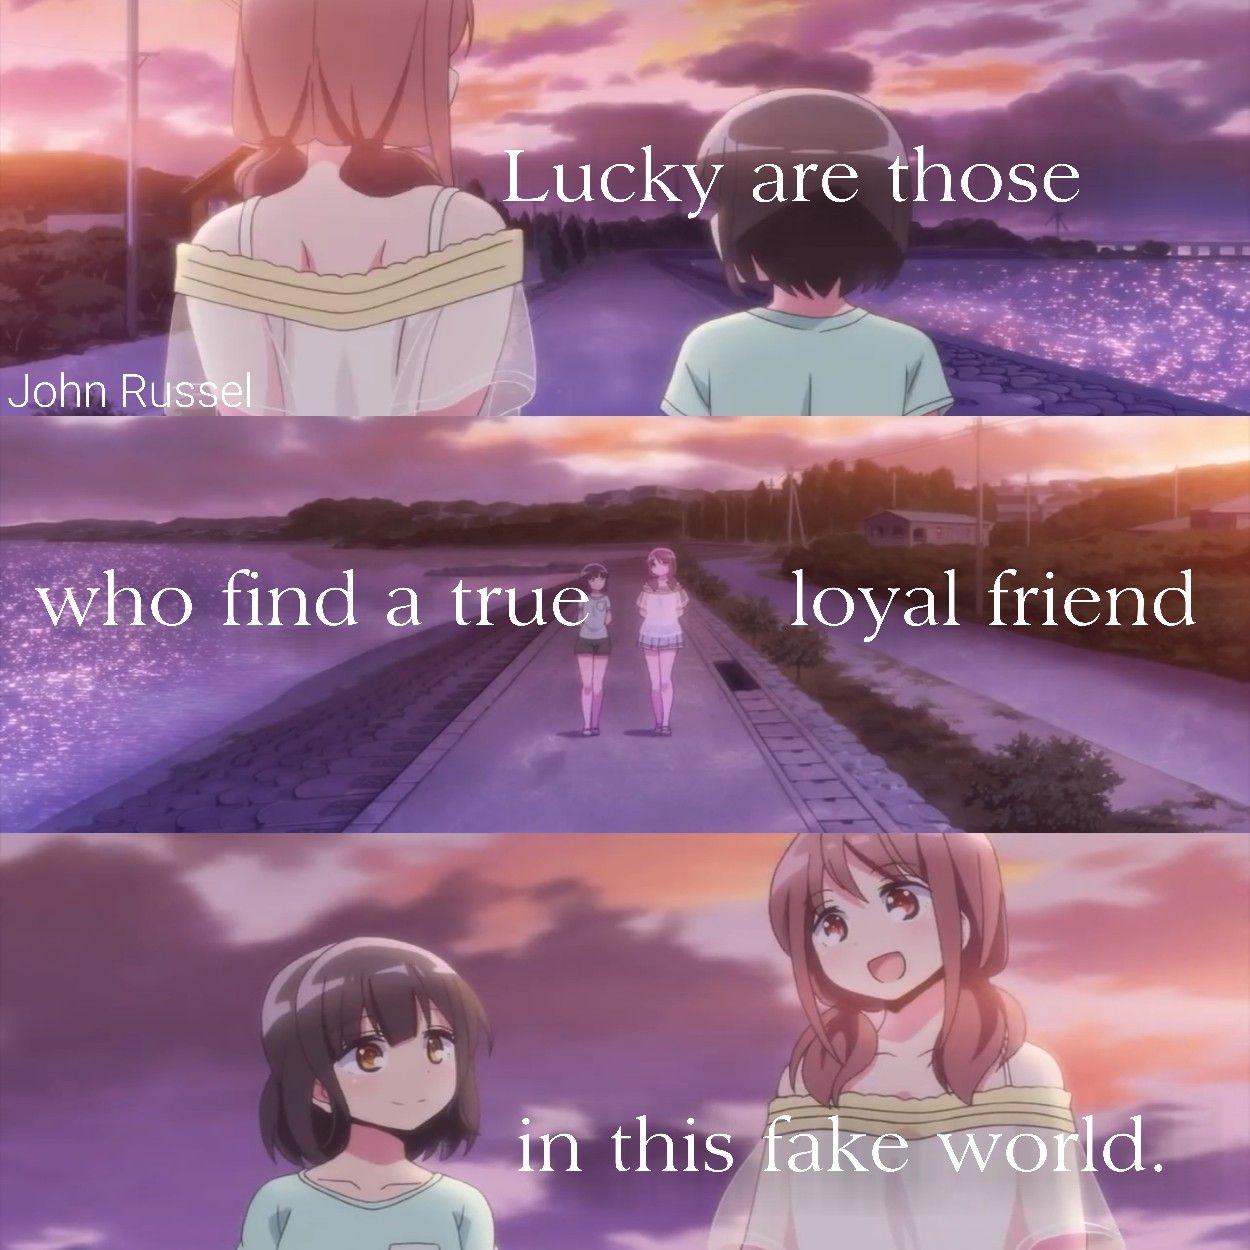 Harukana Receive Anime Quotes Inspirational Manga Quotes Anime Qoutes